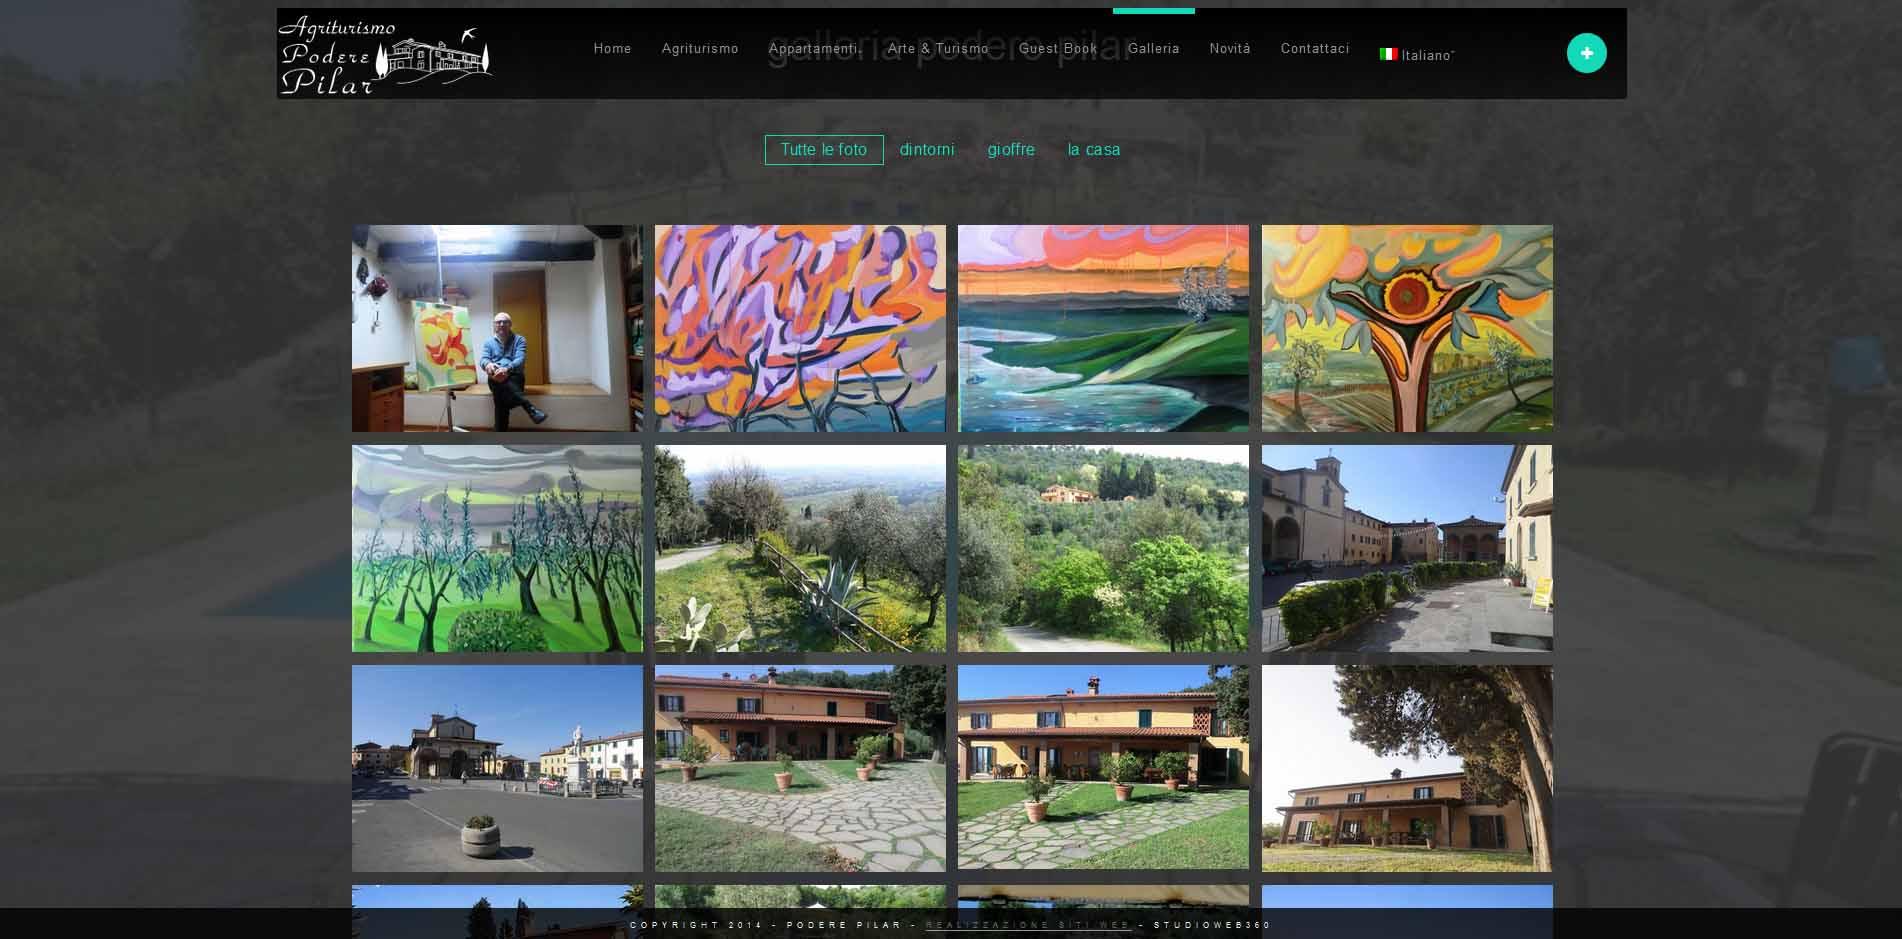 Studioweb360-podere-pilar